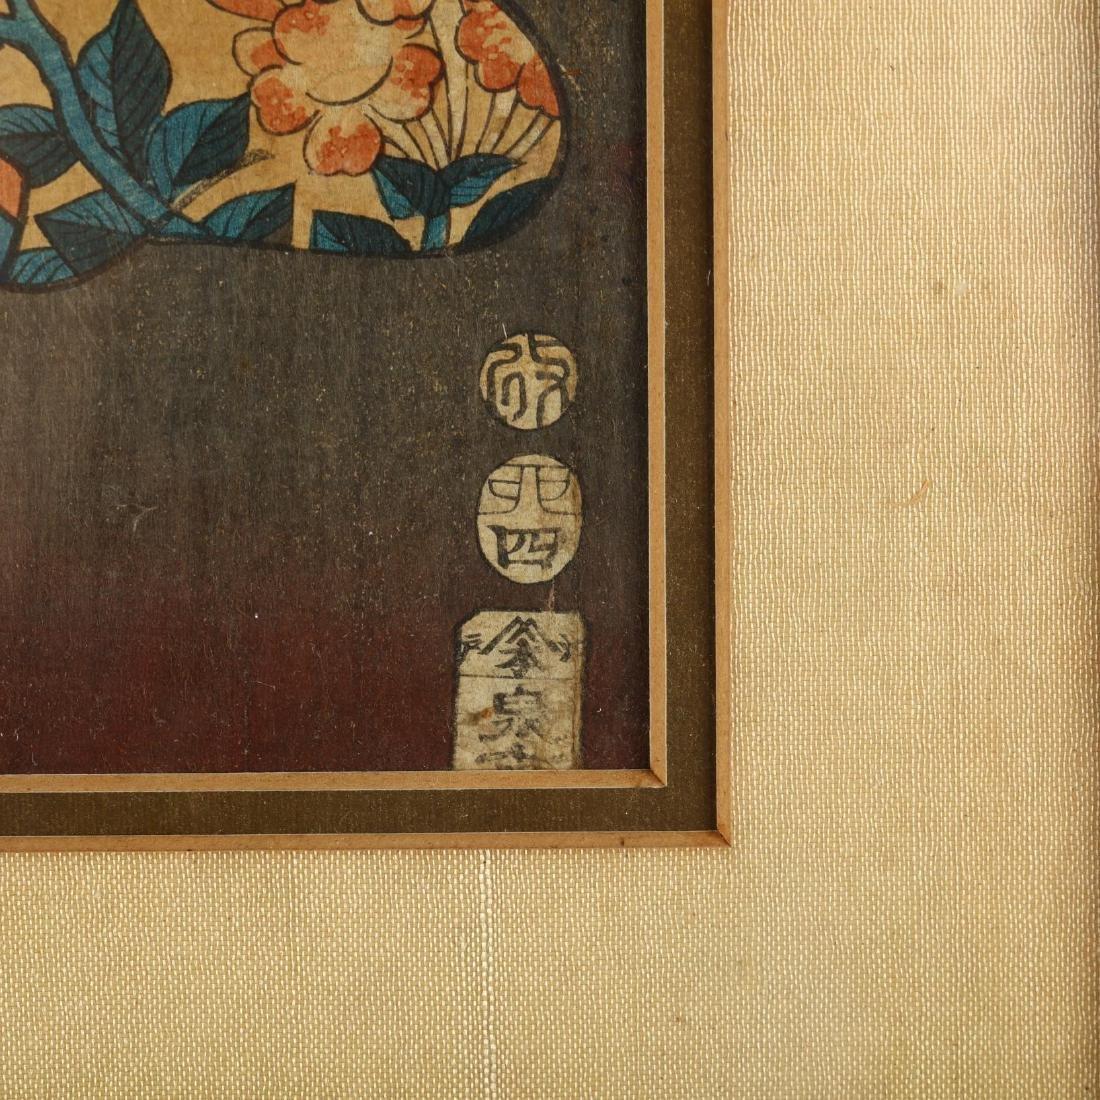 Two Japanese Woodblock Prints by Kunisada and Kuniyoshi - 8